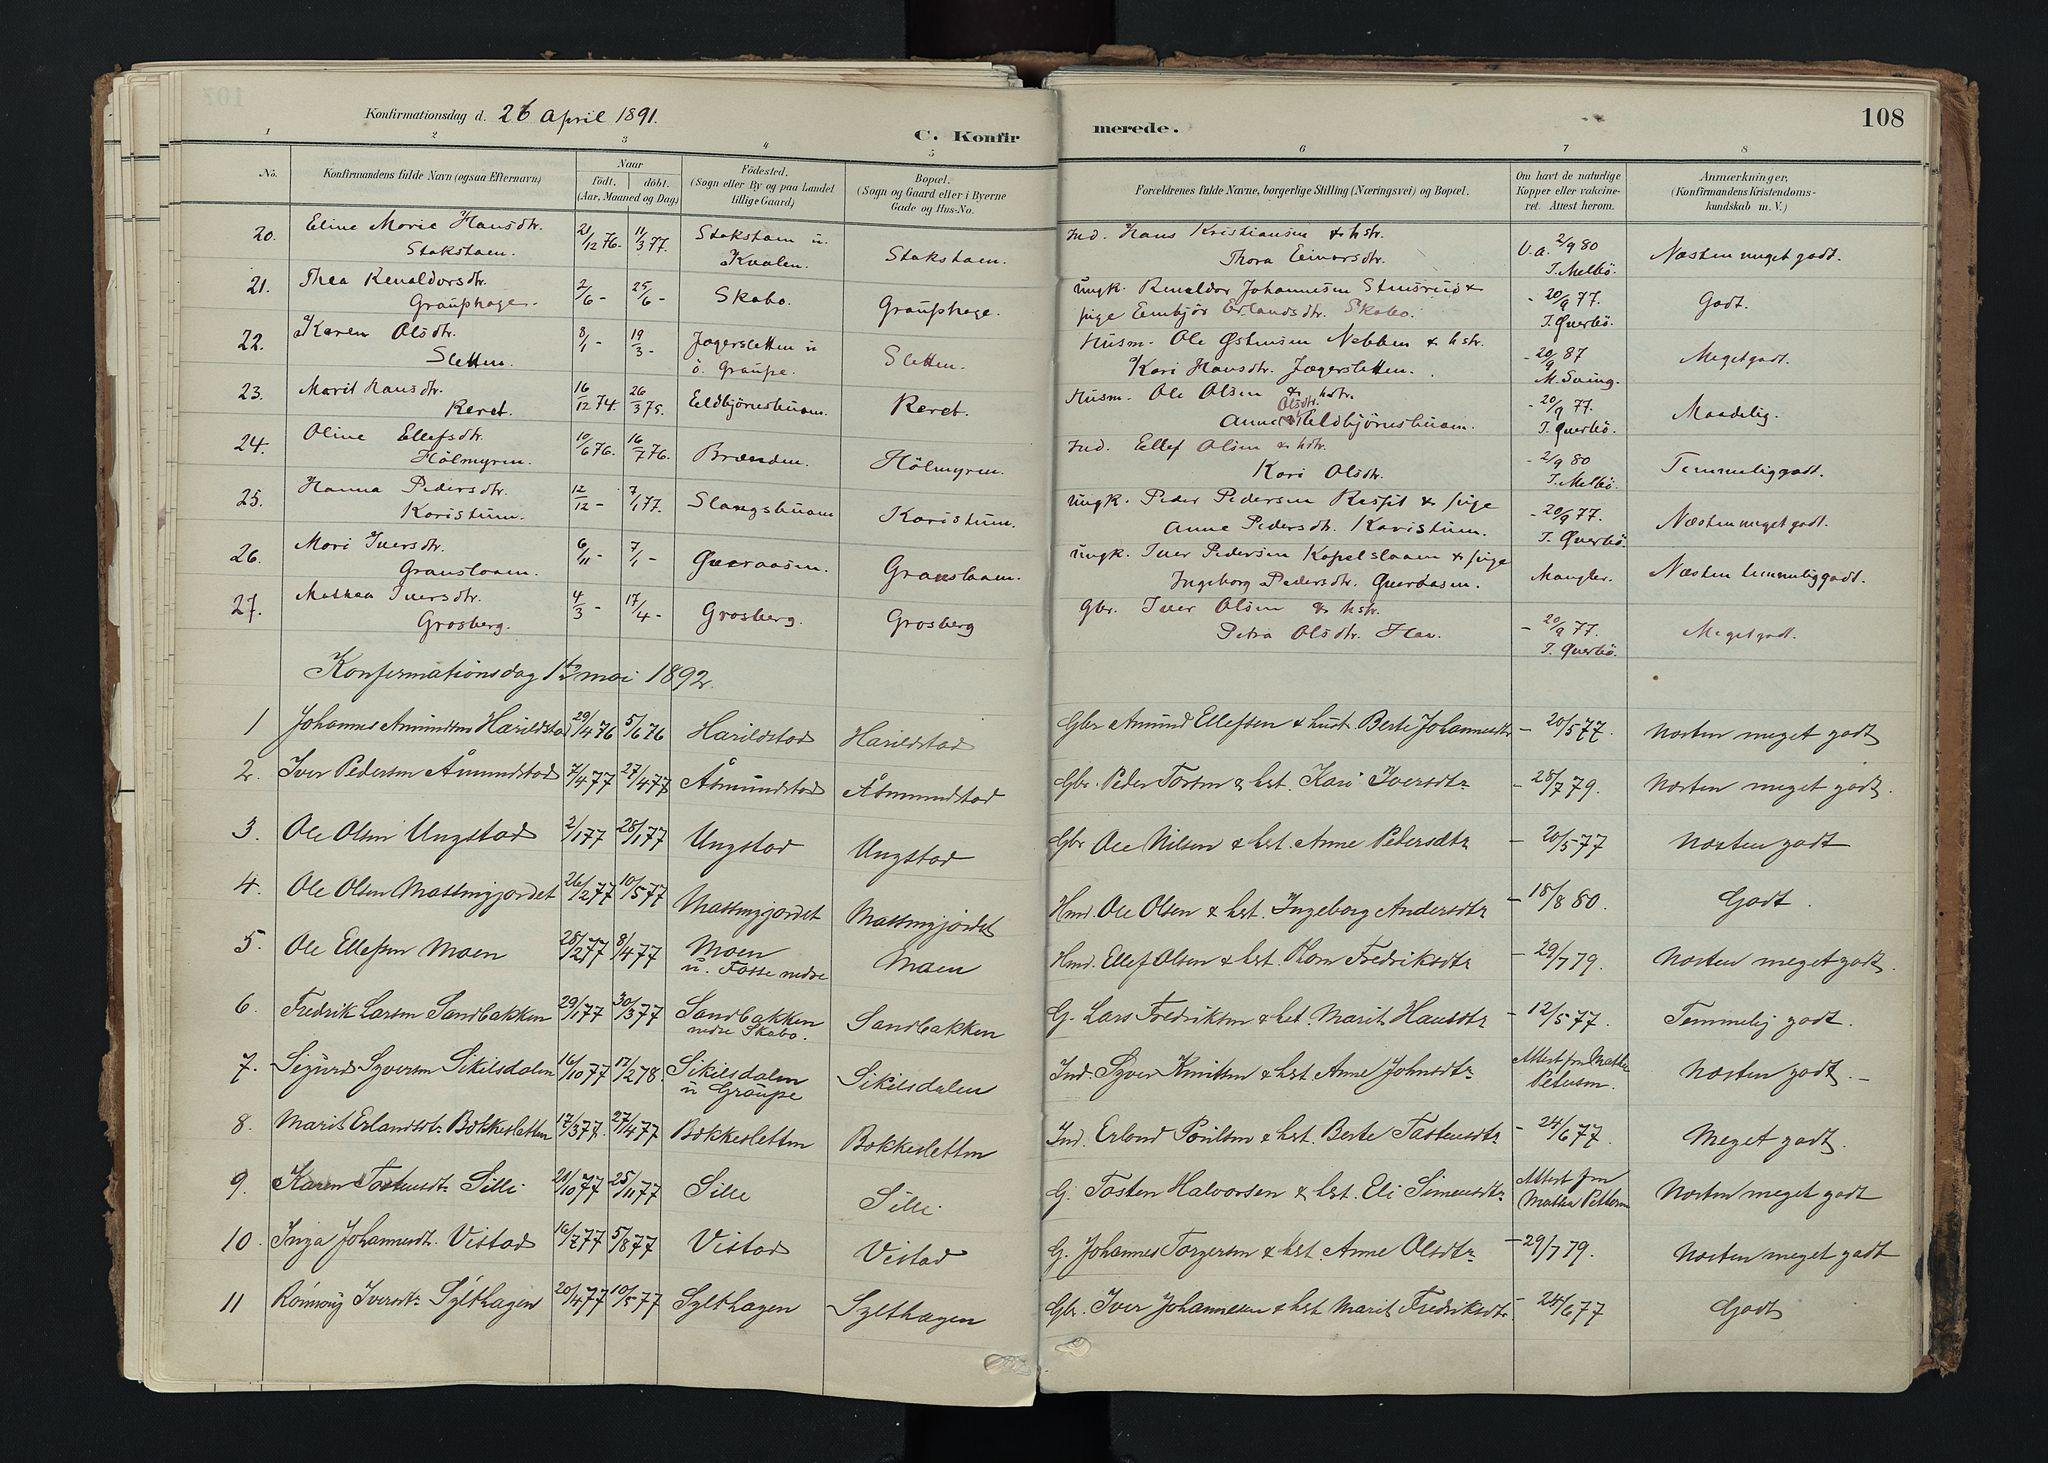 SAH, Nord-Fron prestekontor, Ministerialbok nr. 5, 1884-1914, s. 108